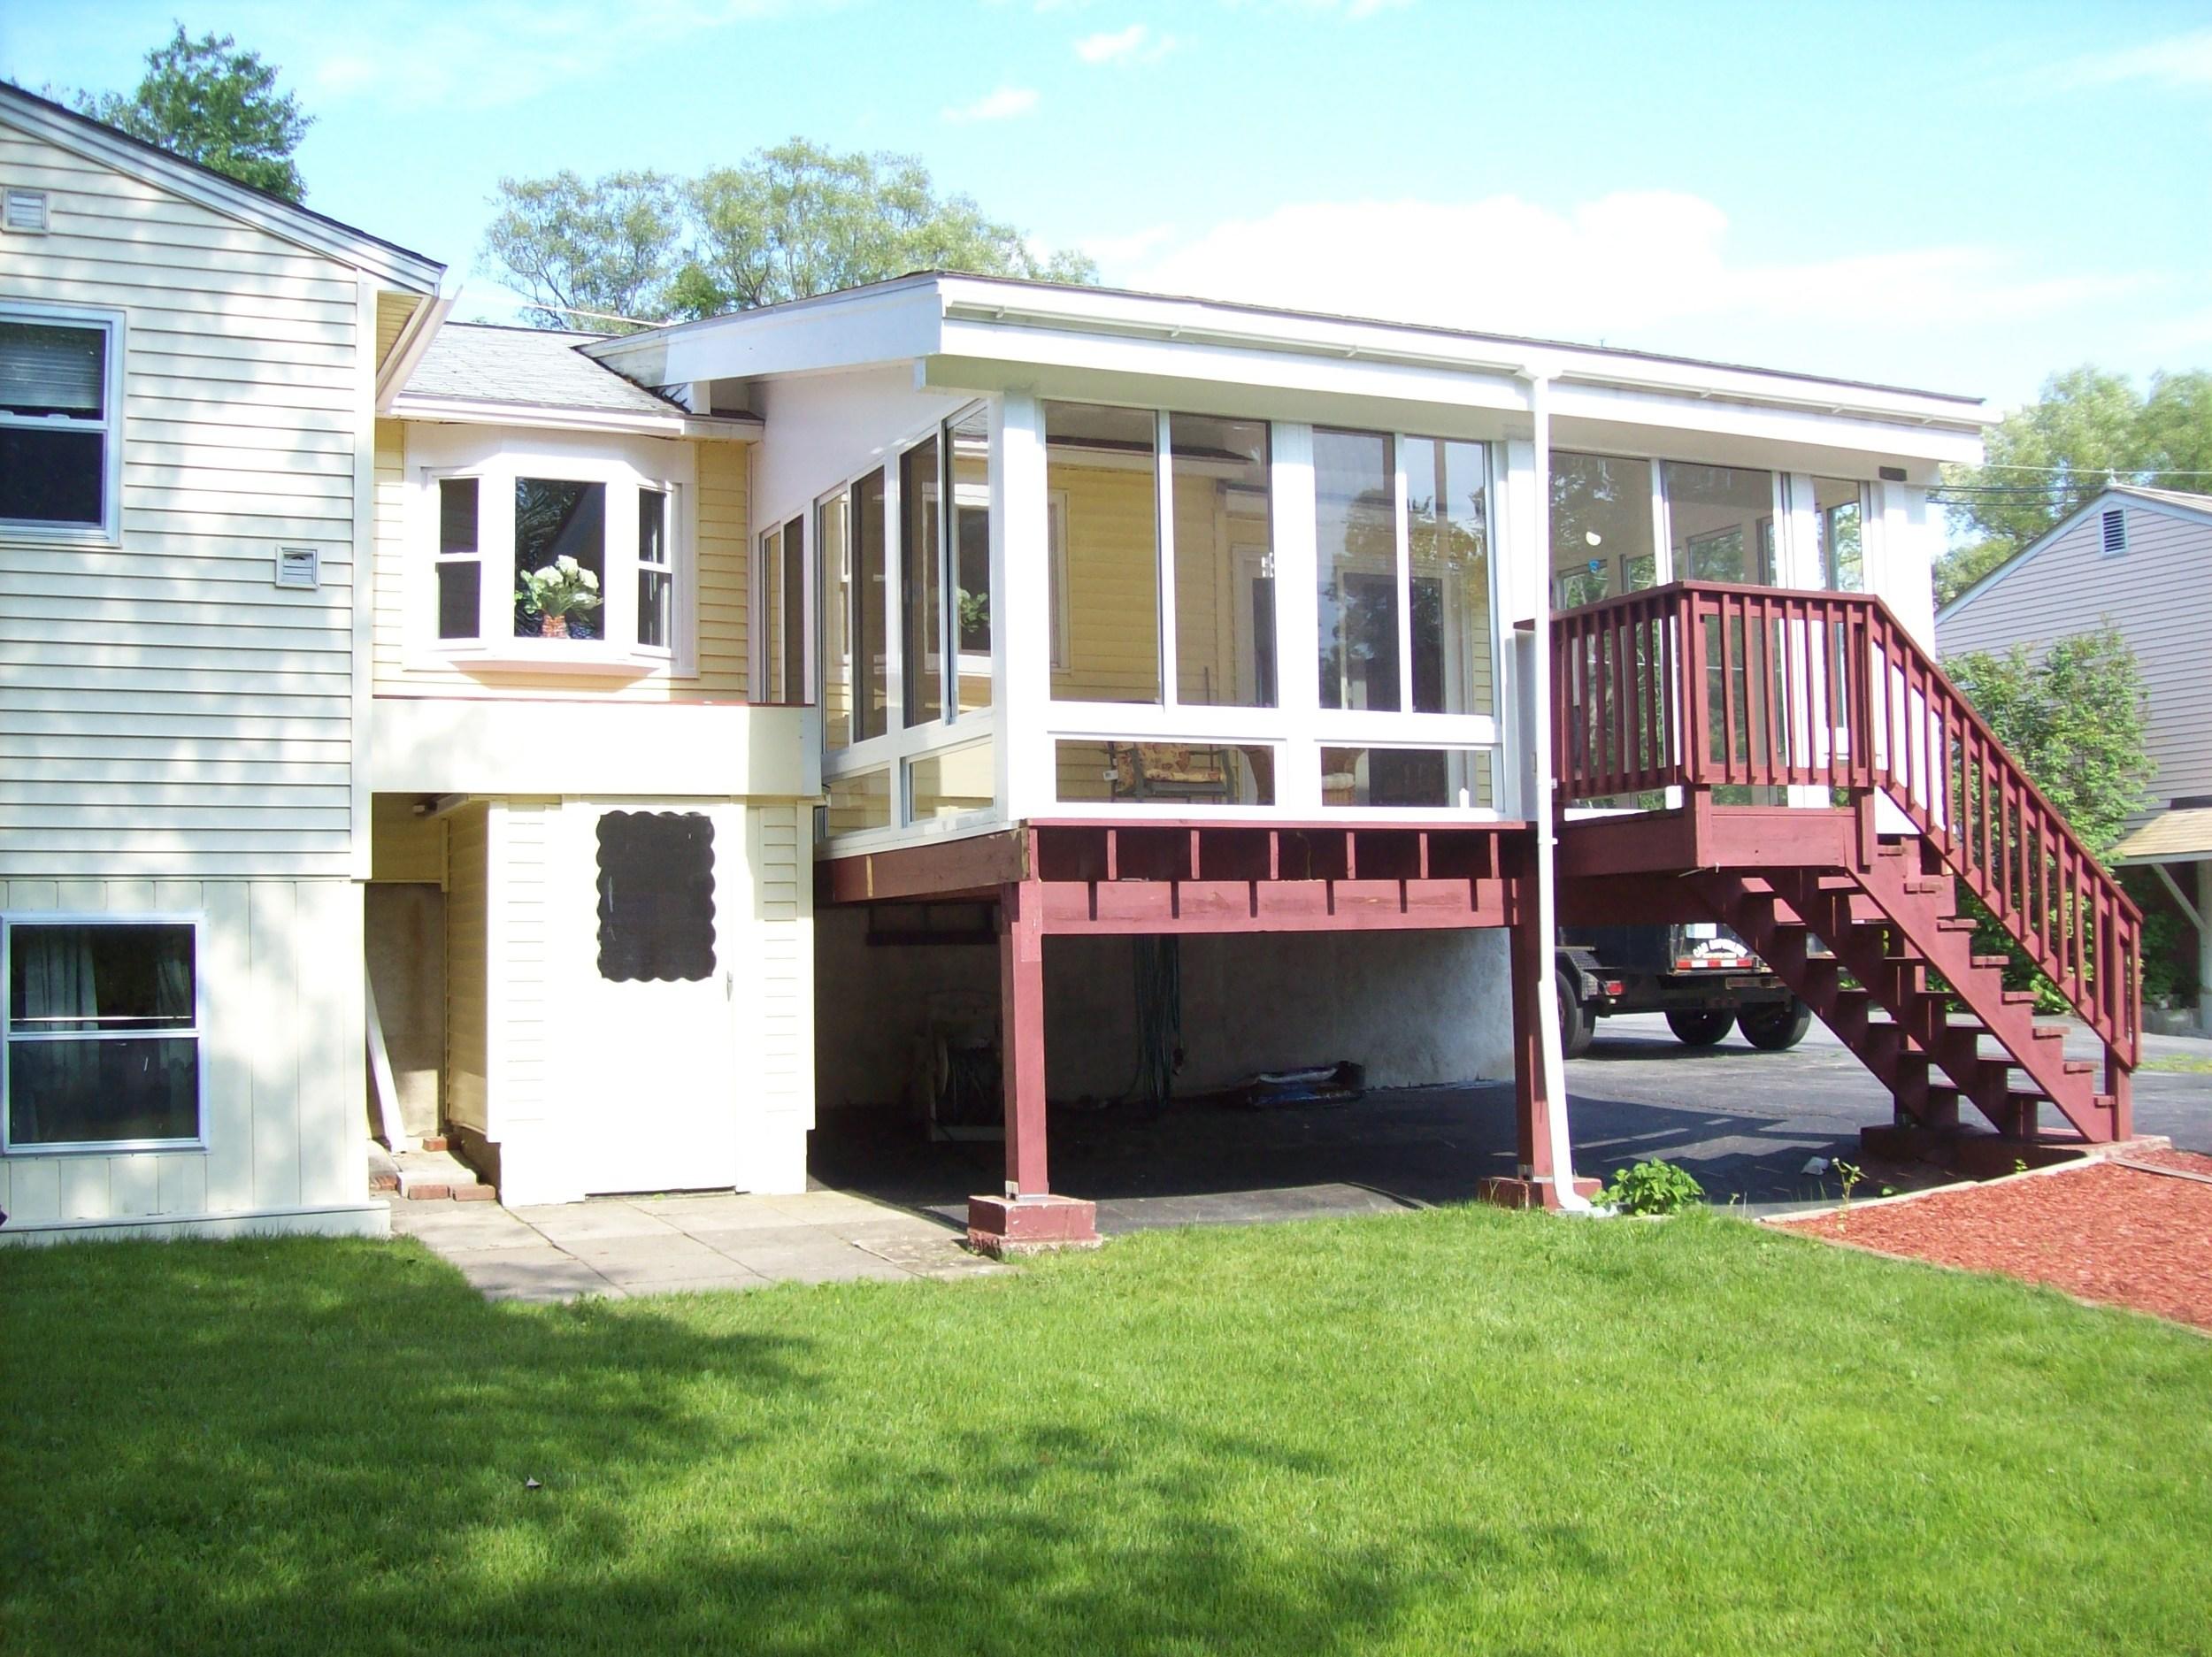 Enclosed Porch After